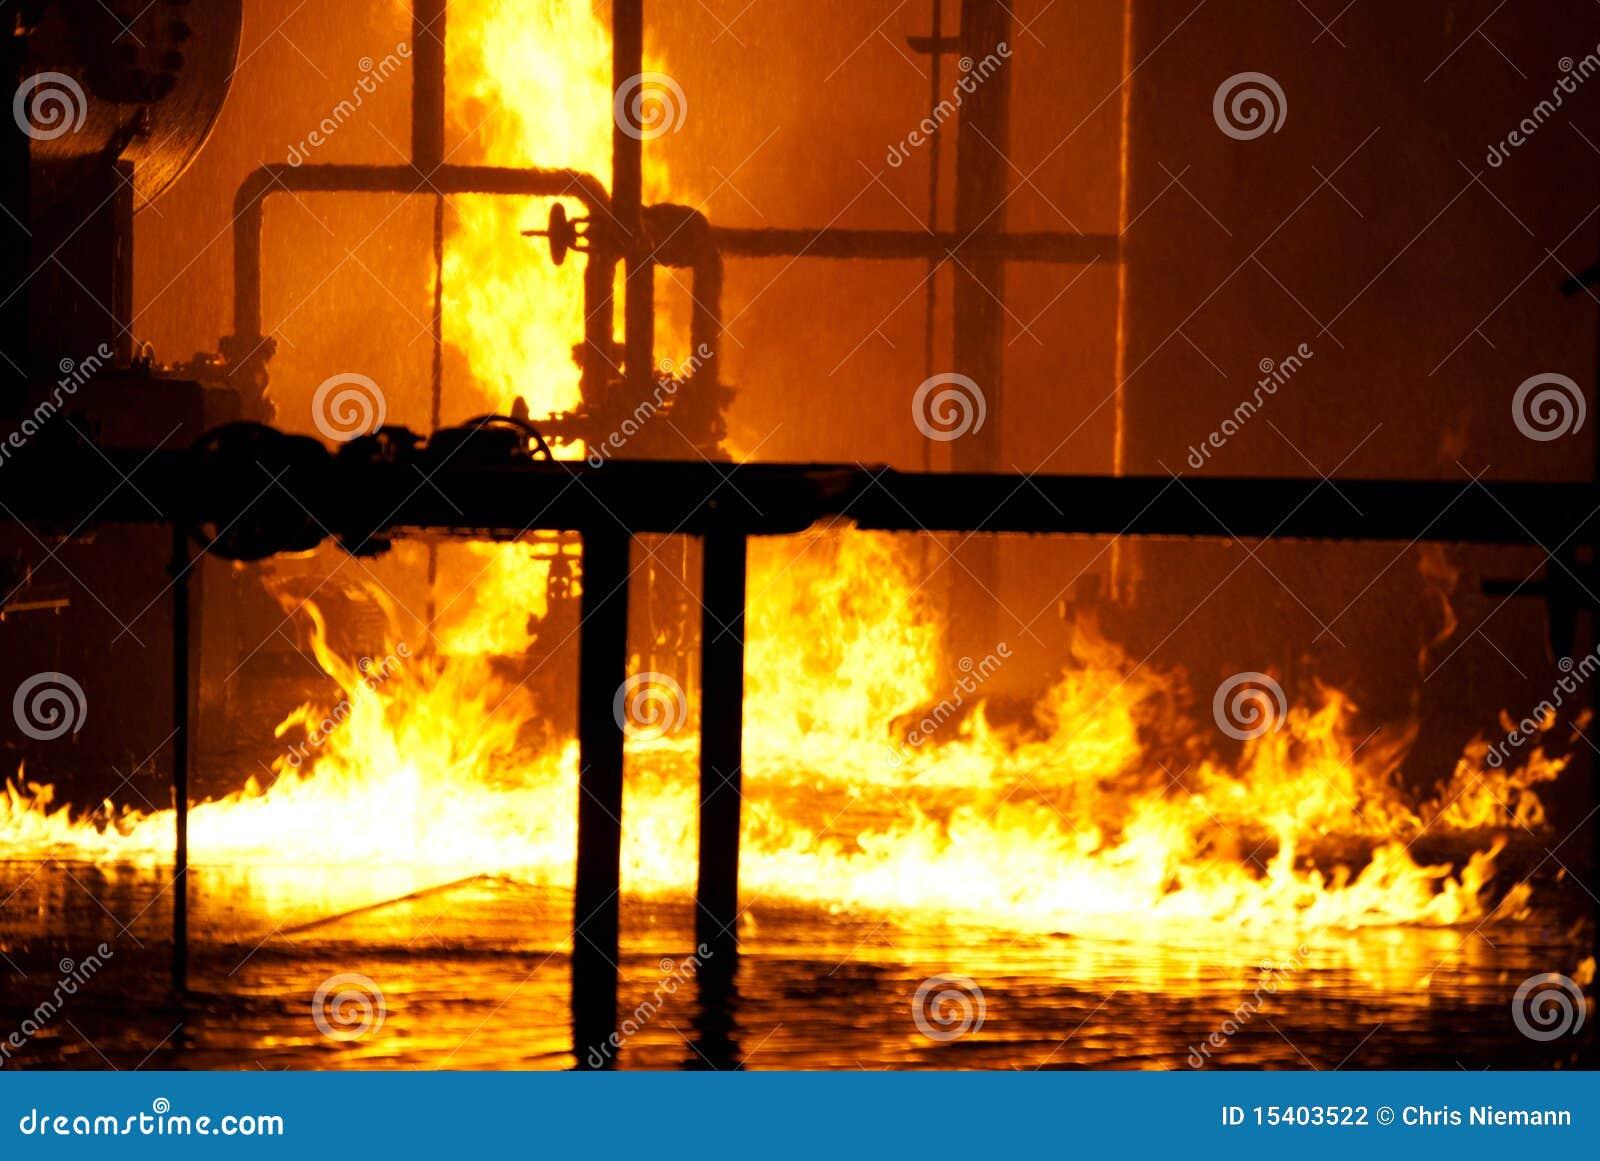 Industriële brand